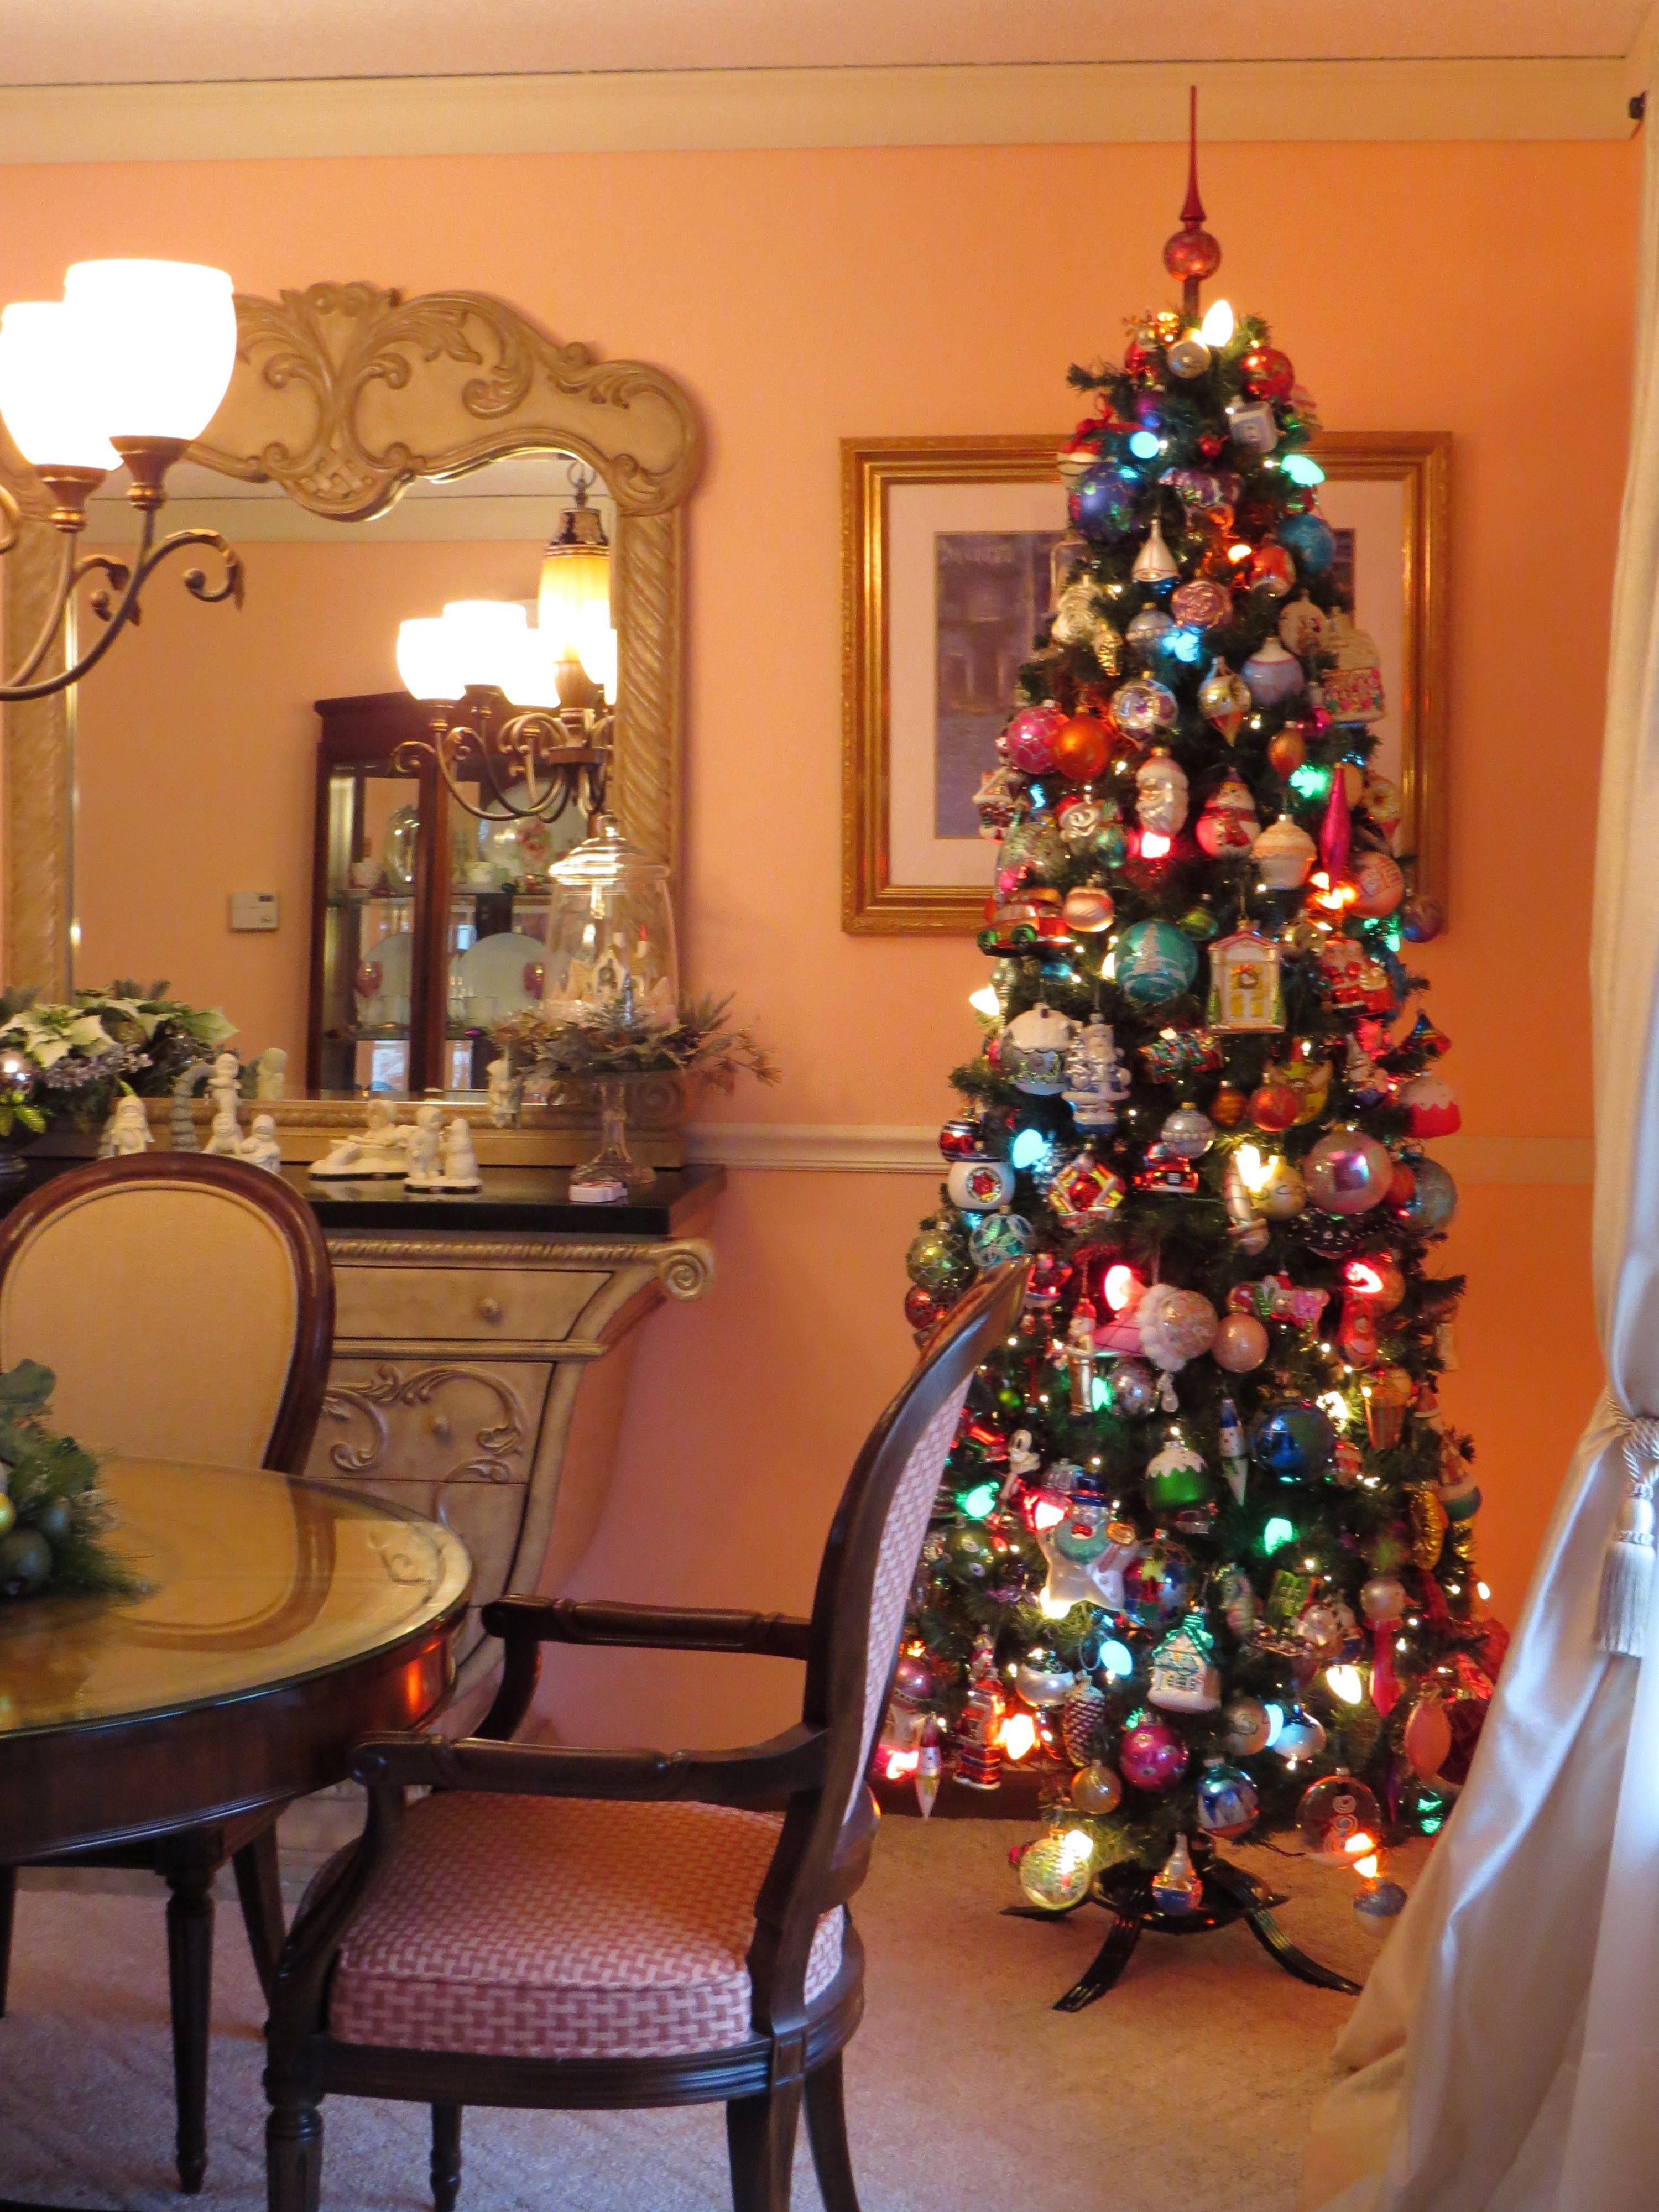 Glass Ornaments Christmas Tree  #GlassOrnaments #Christmas #ColorfulChristmas #ChristmasTree